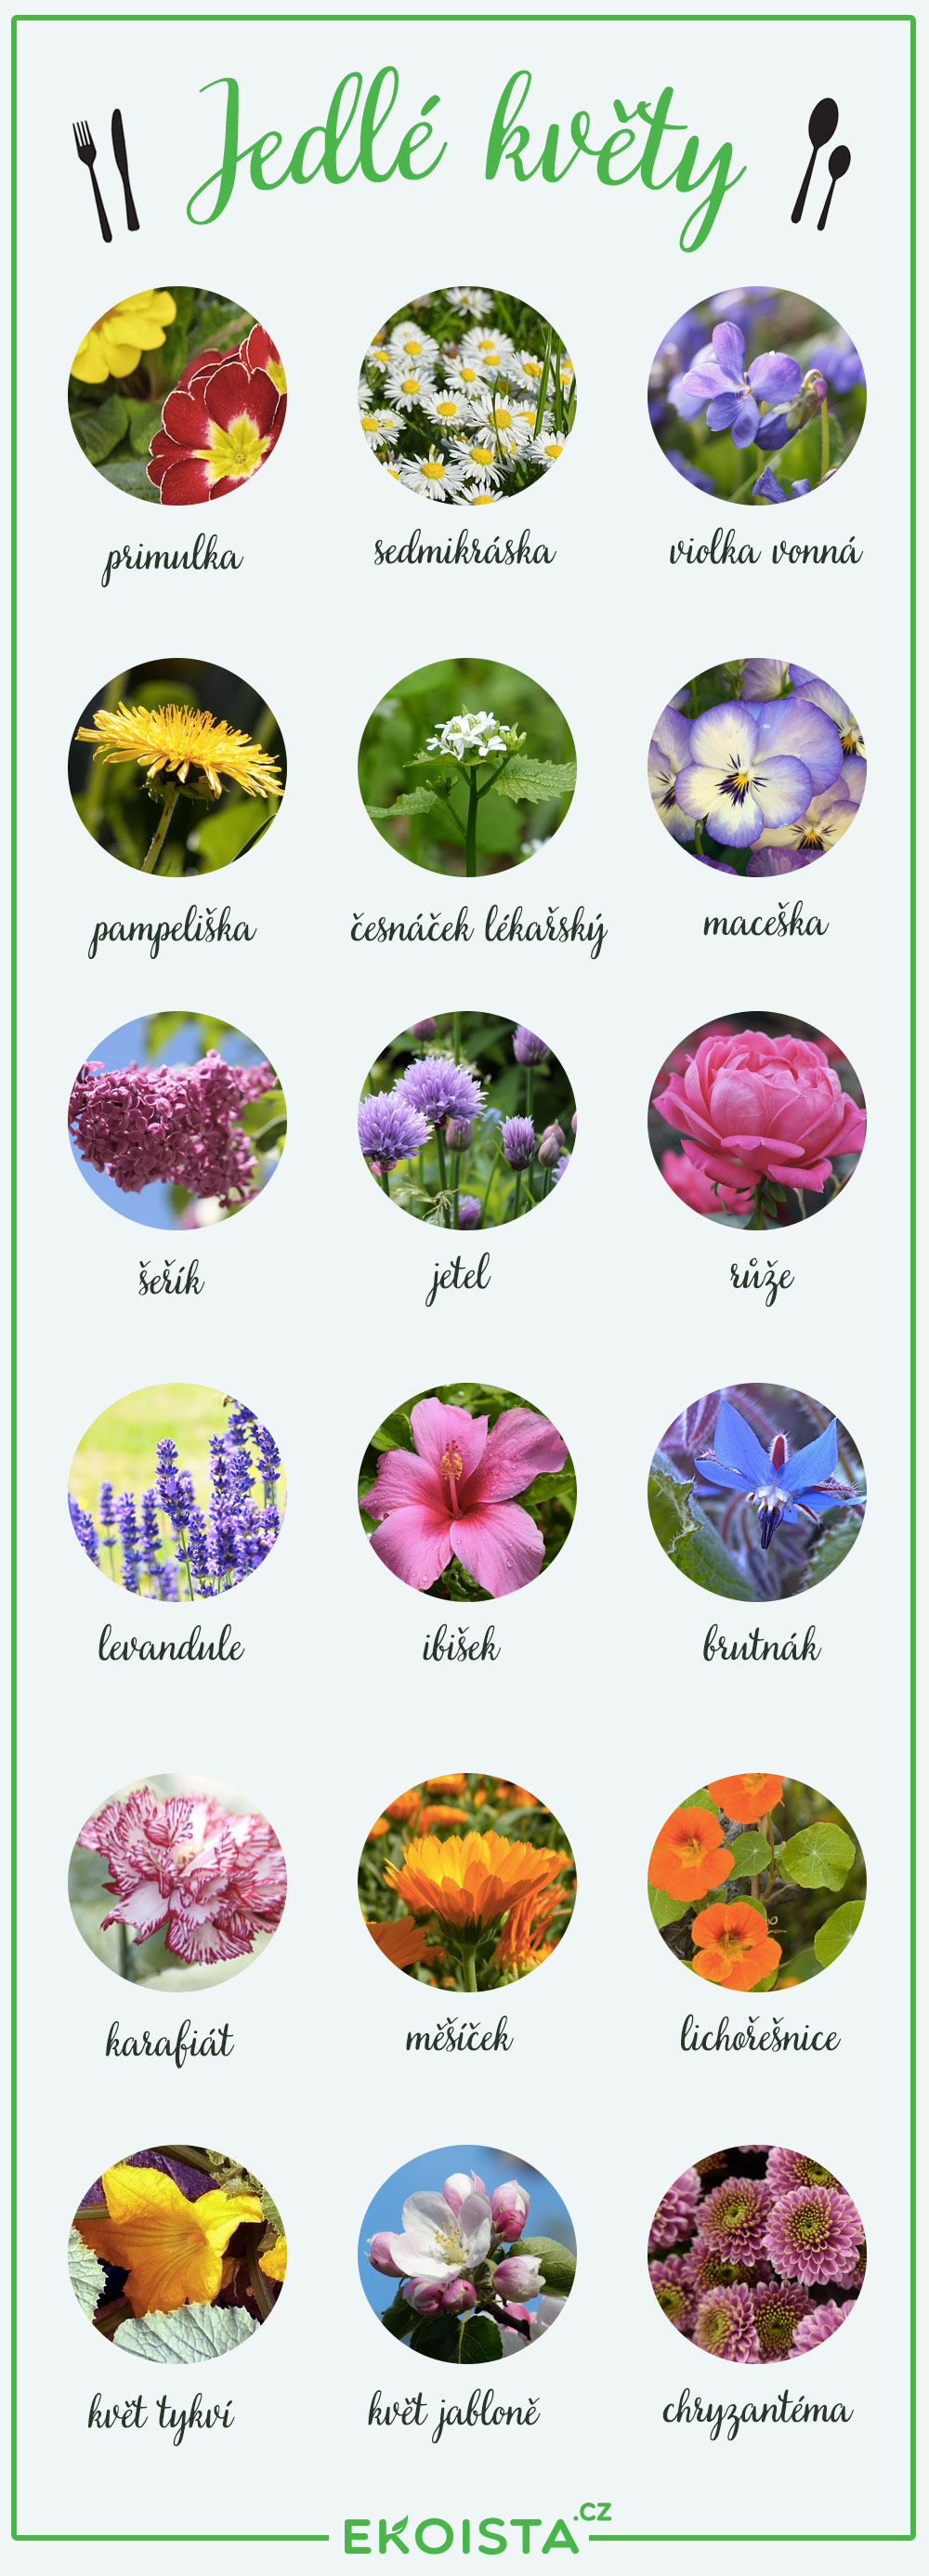 jedle-kvety-infografika